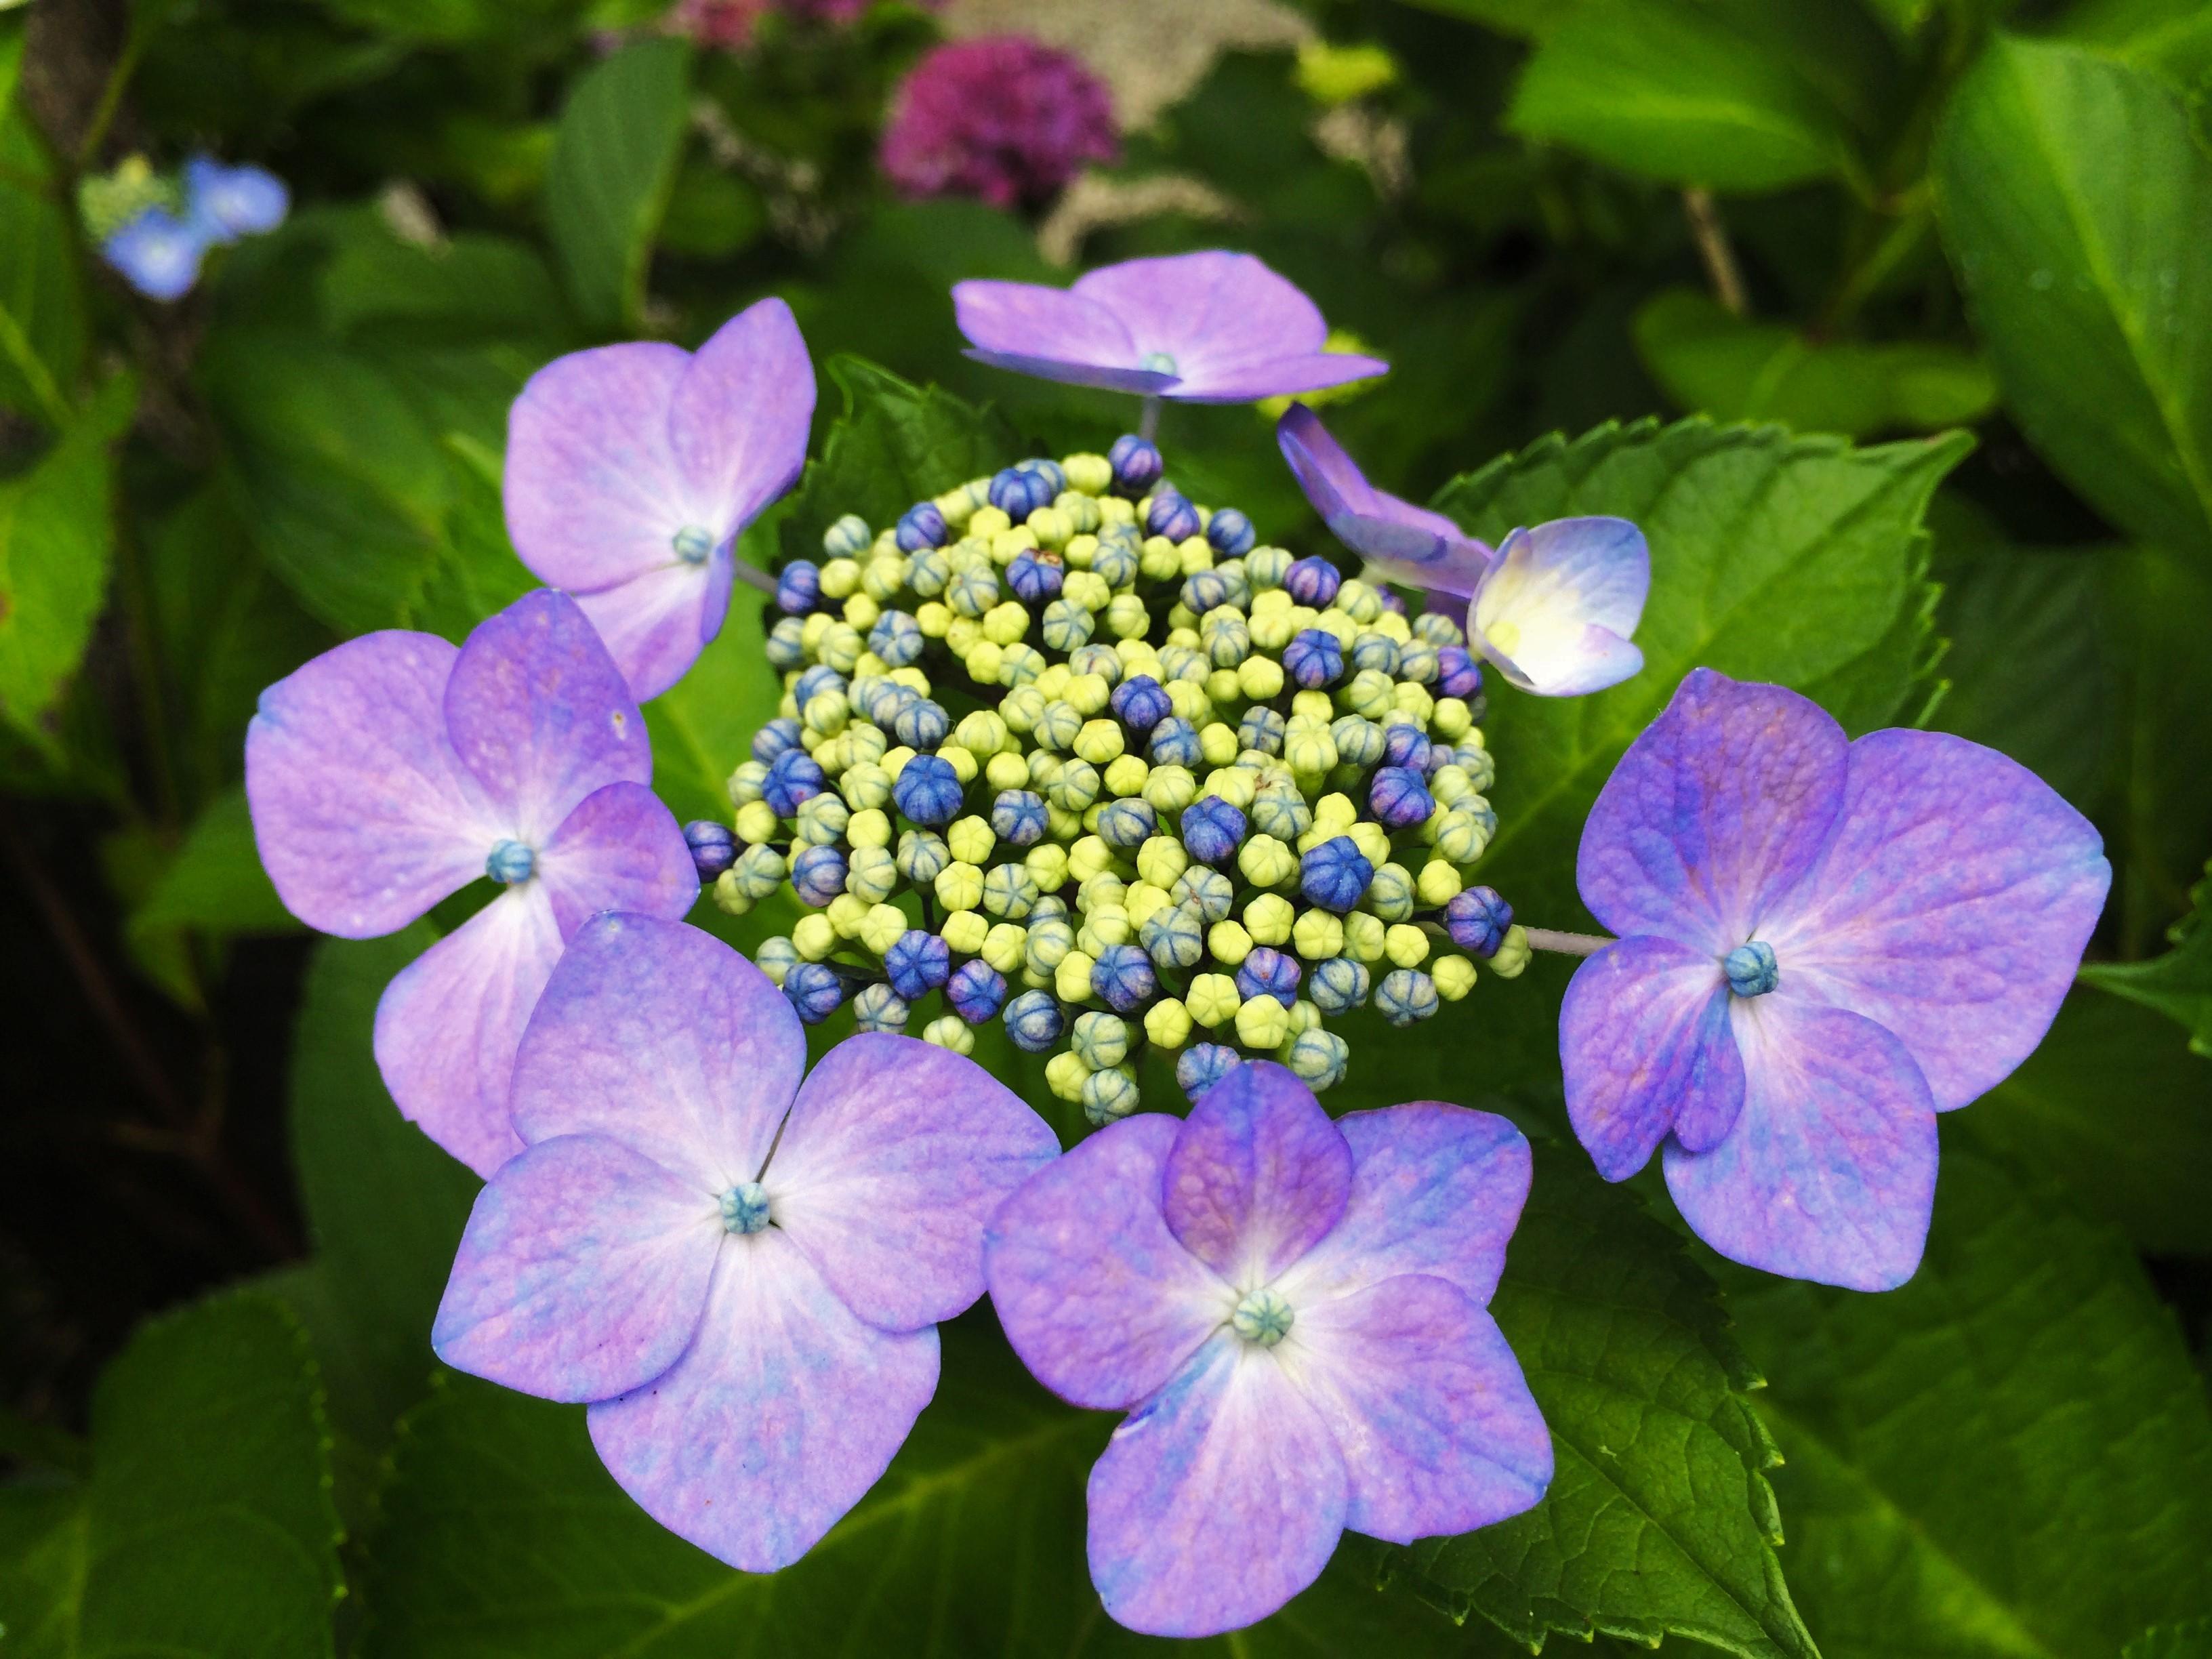 Purpleblue Japanese Flower By Wowsteph On Deviantart